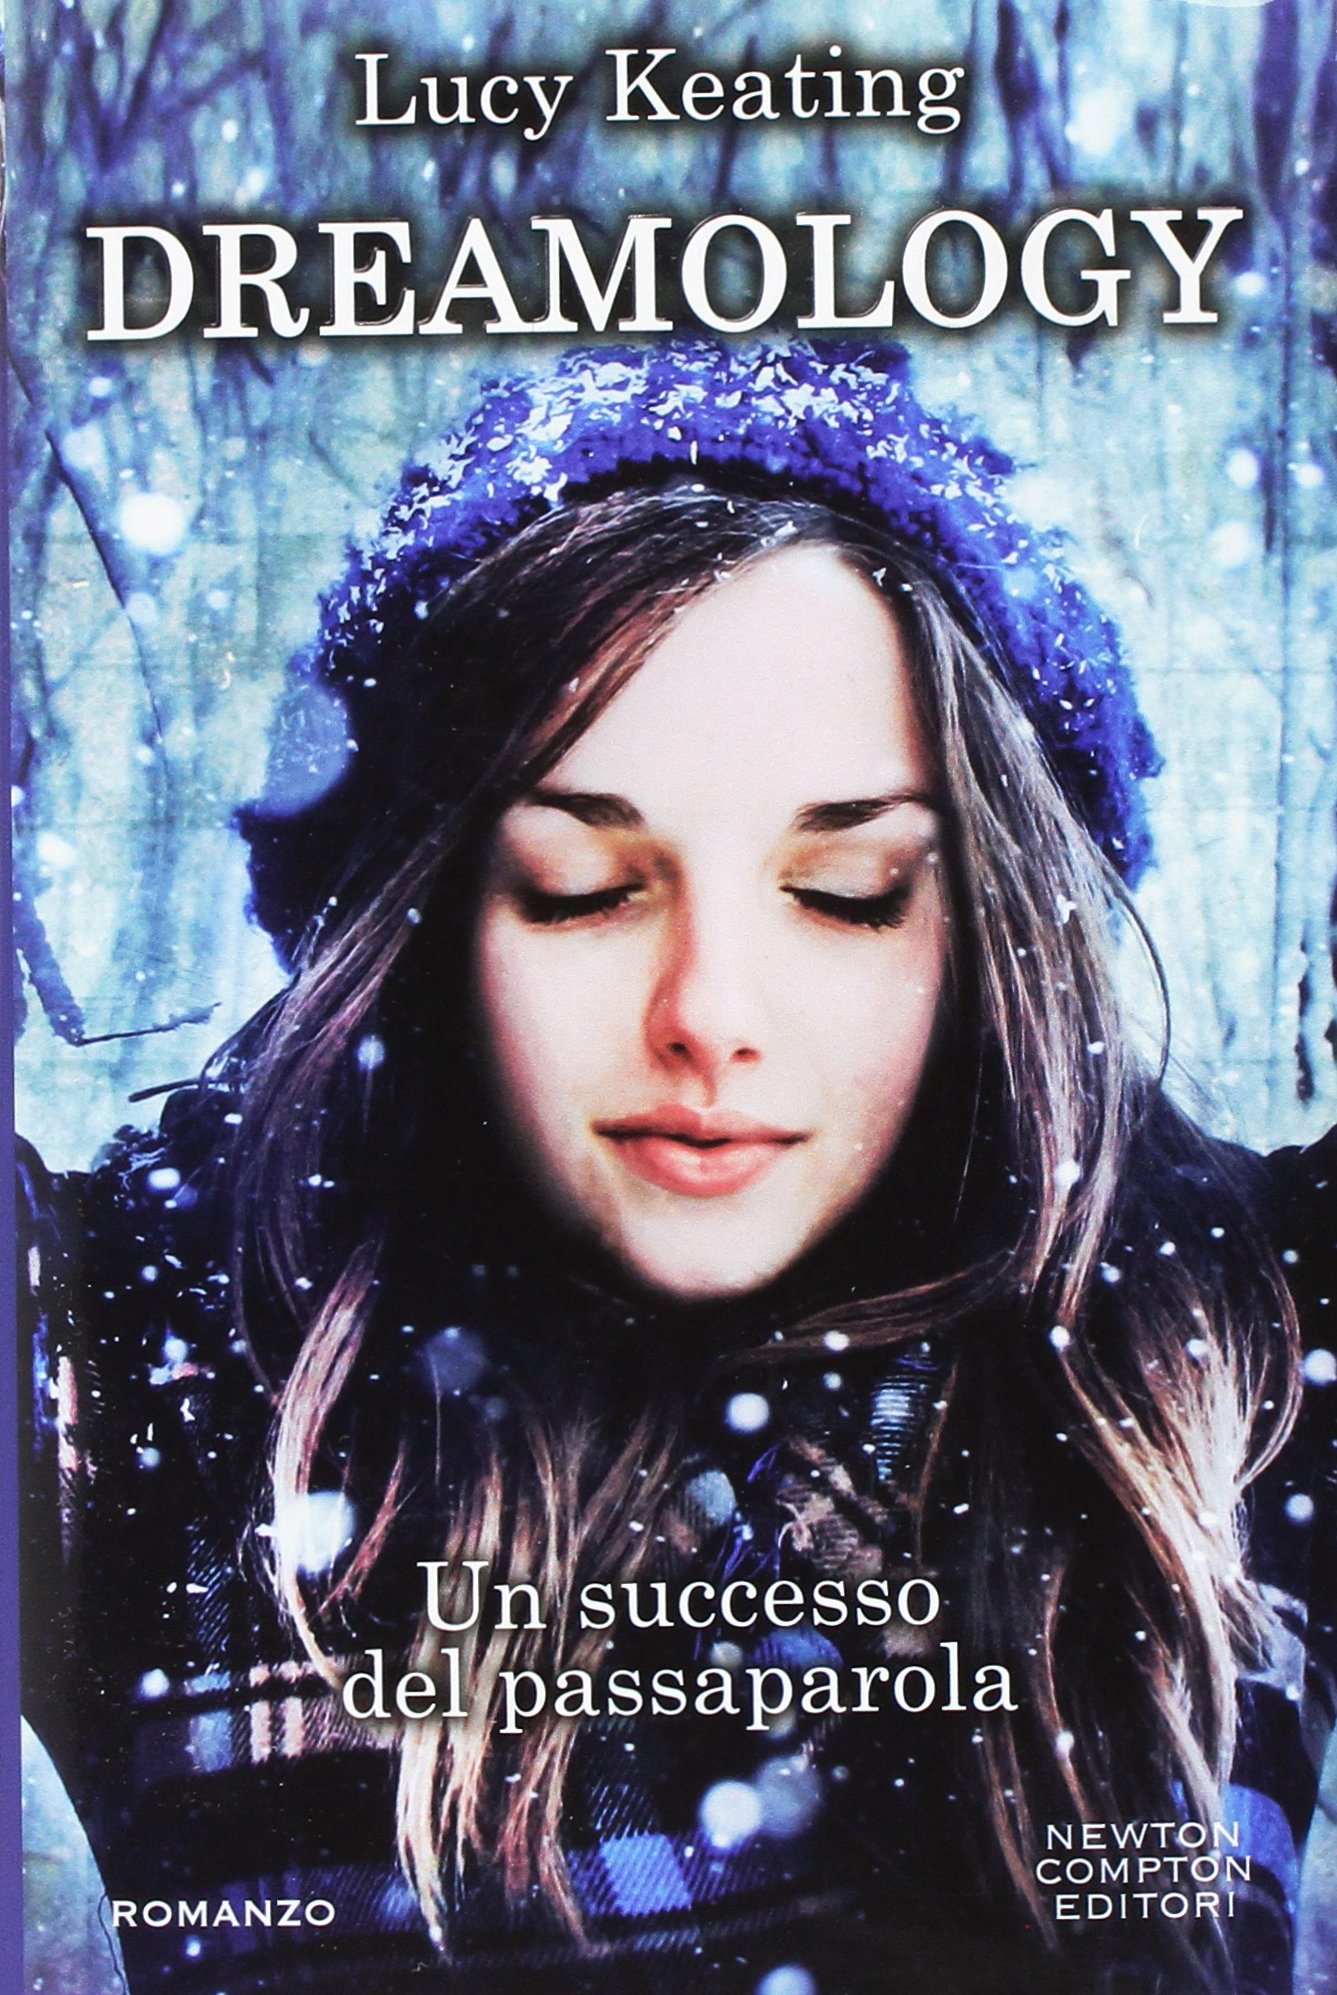 Dreamology: Amazon.it: Keating, Lucy, Sterza, T.: Libri